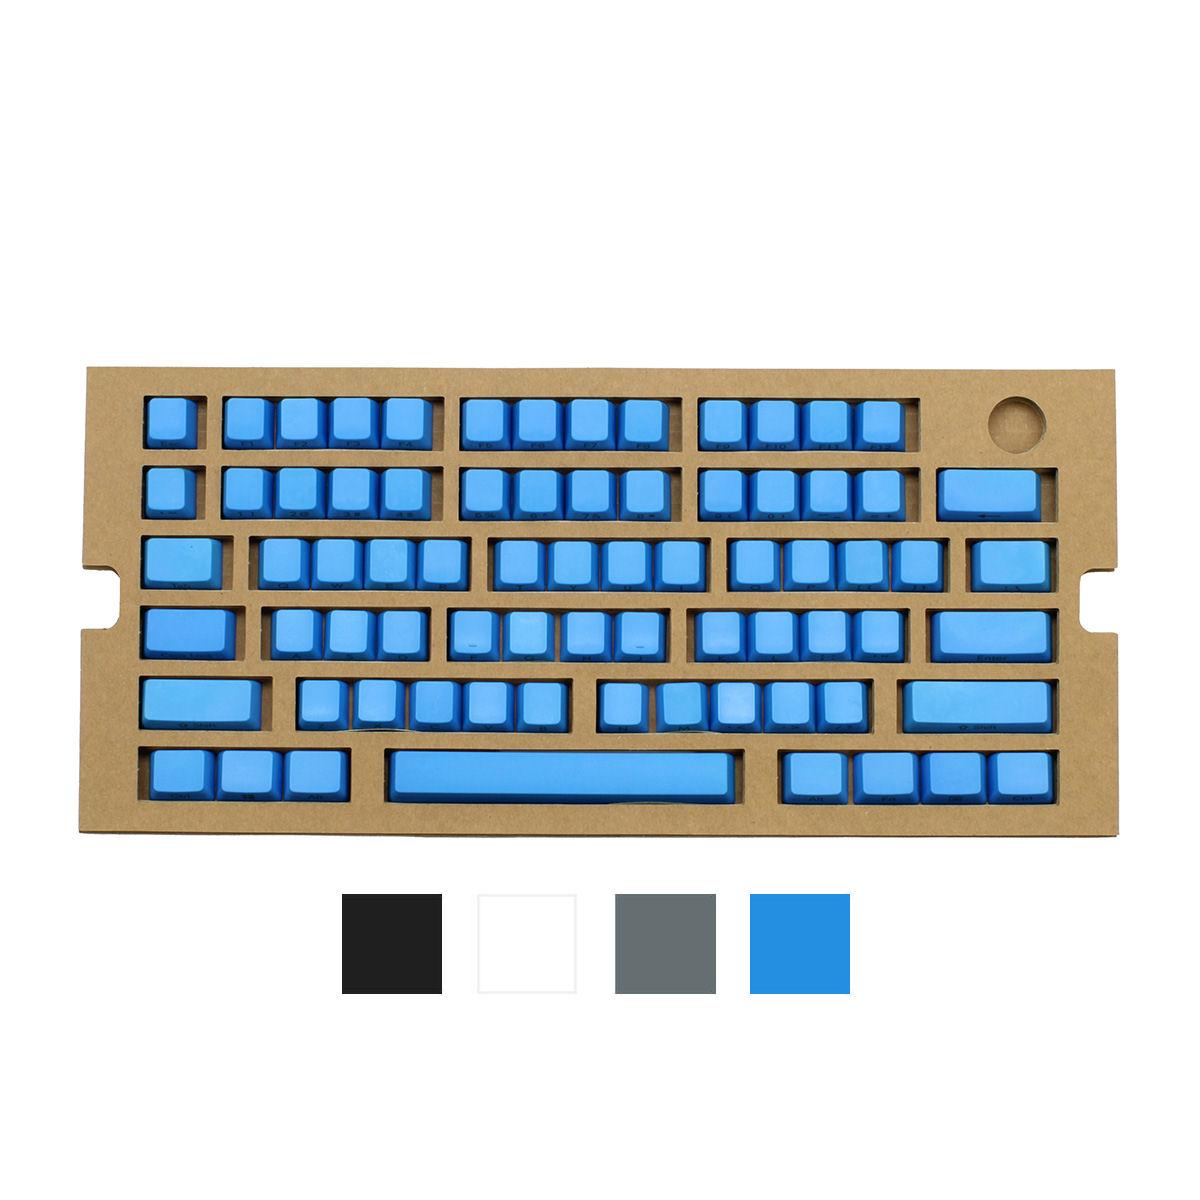 MAX Ansi PBT 104-key Cherry MX Keycap Set (Front Side Print)